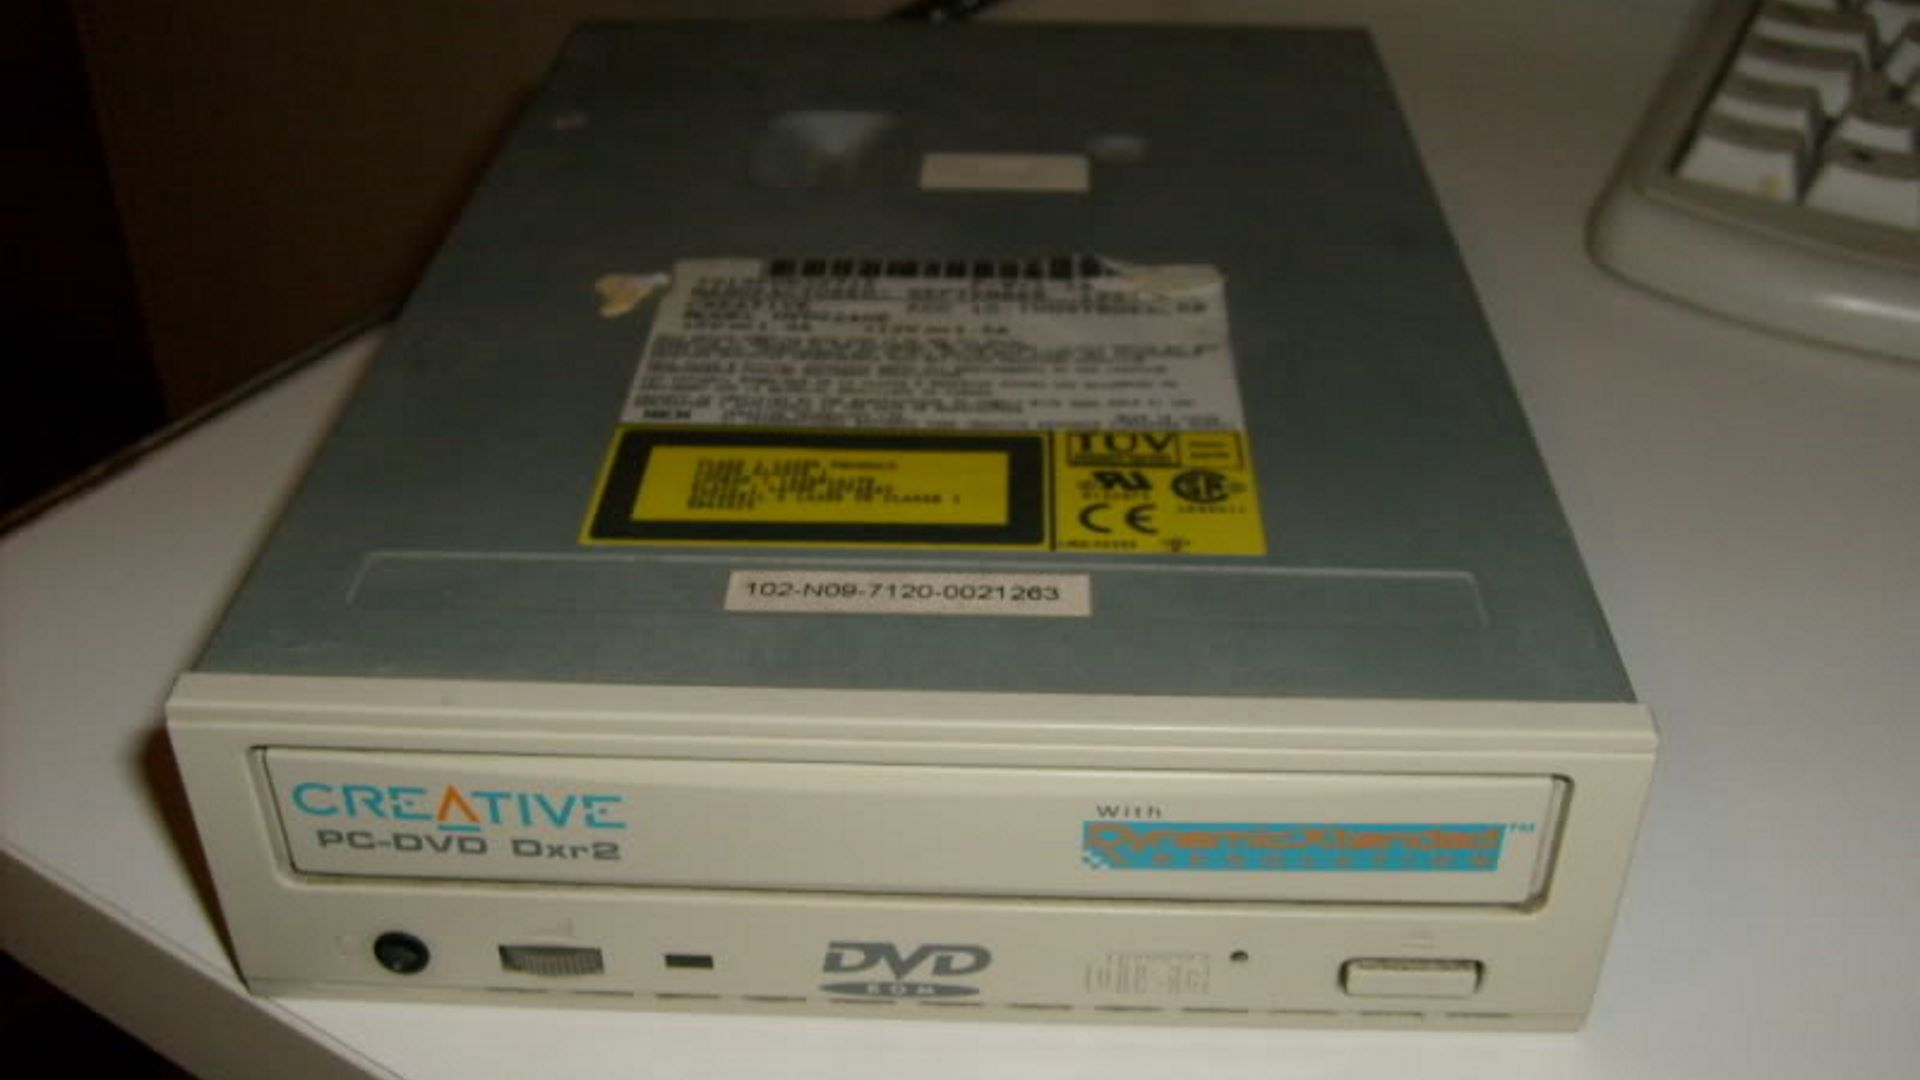 CREATIVE DVD2240E WINDOWS 8.1 DRIVER